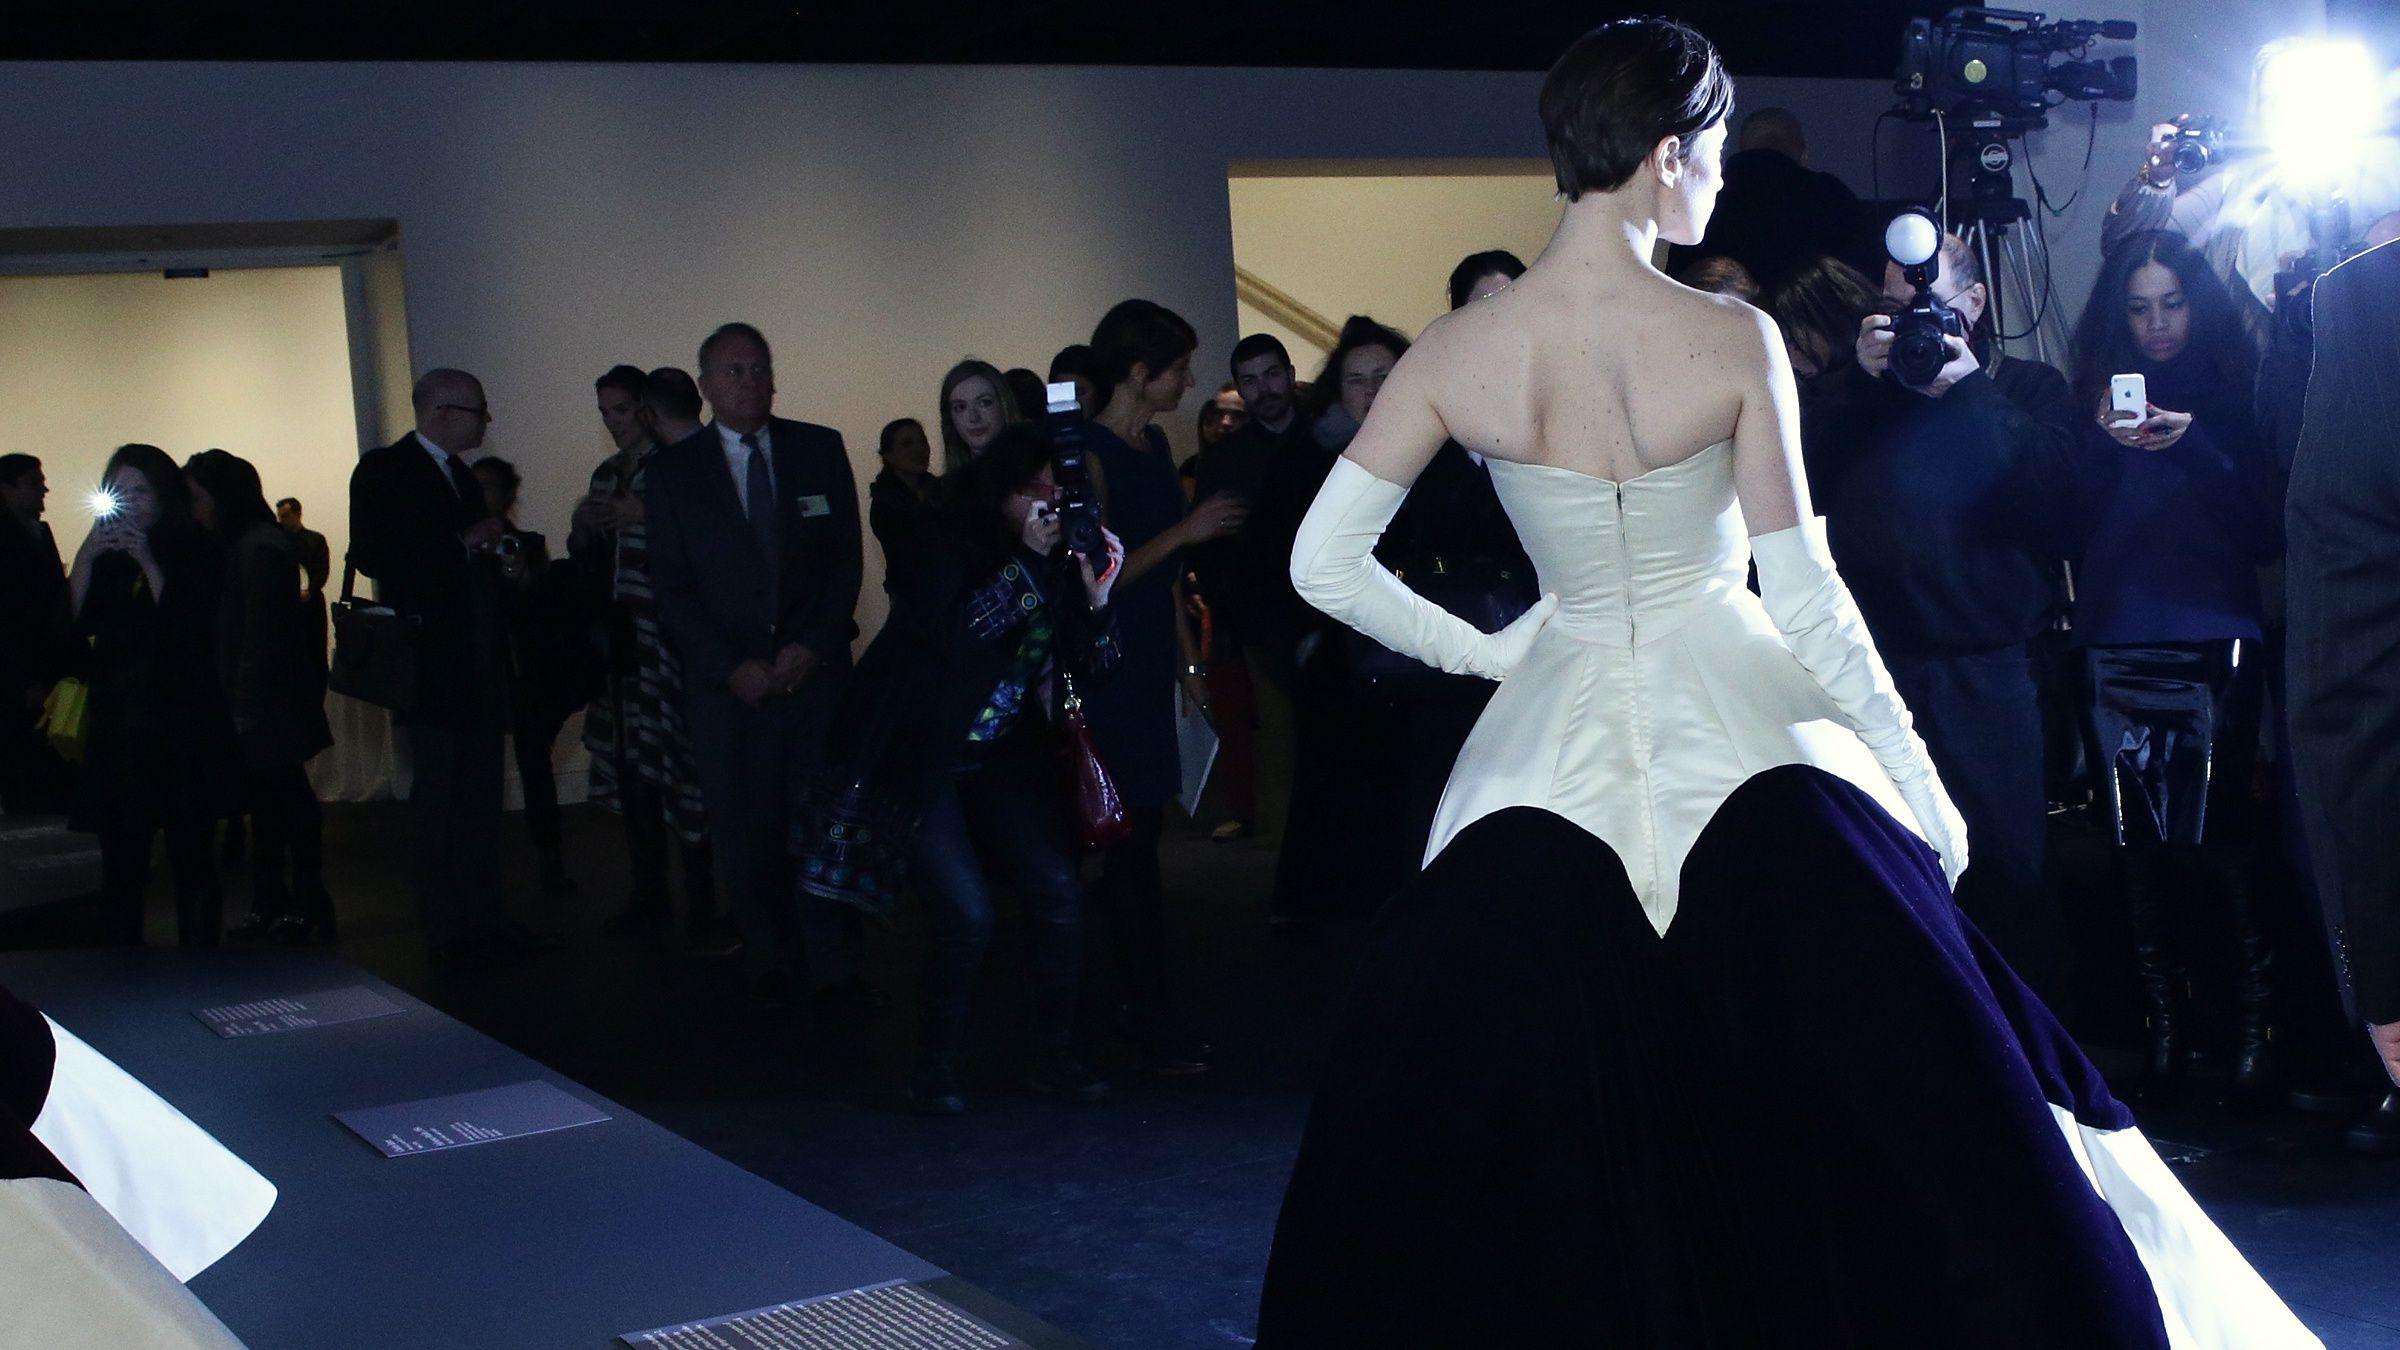 charles james, zac posen, Elettra Wiedemann, style, fashion, lifestyle, couture, gown, womenswear